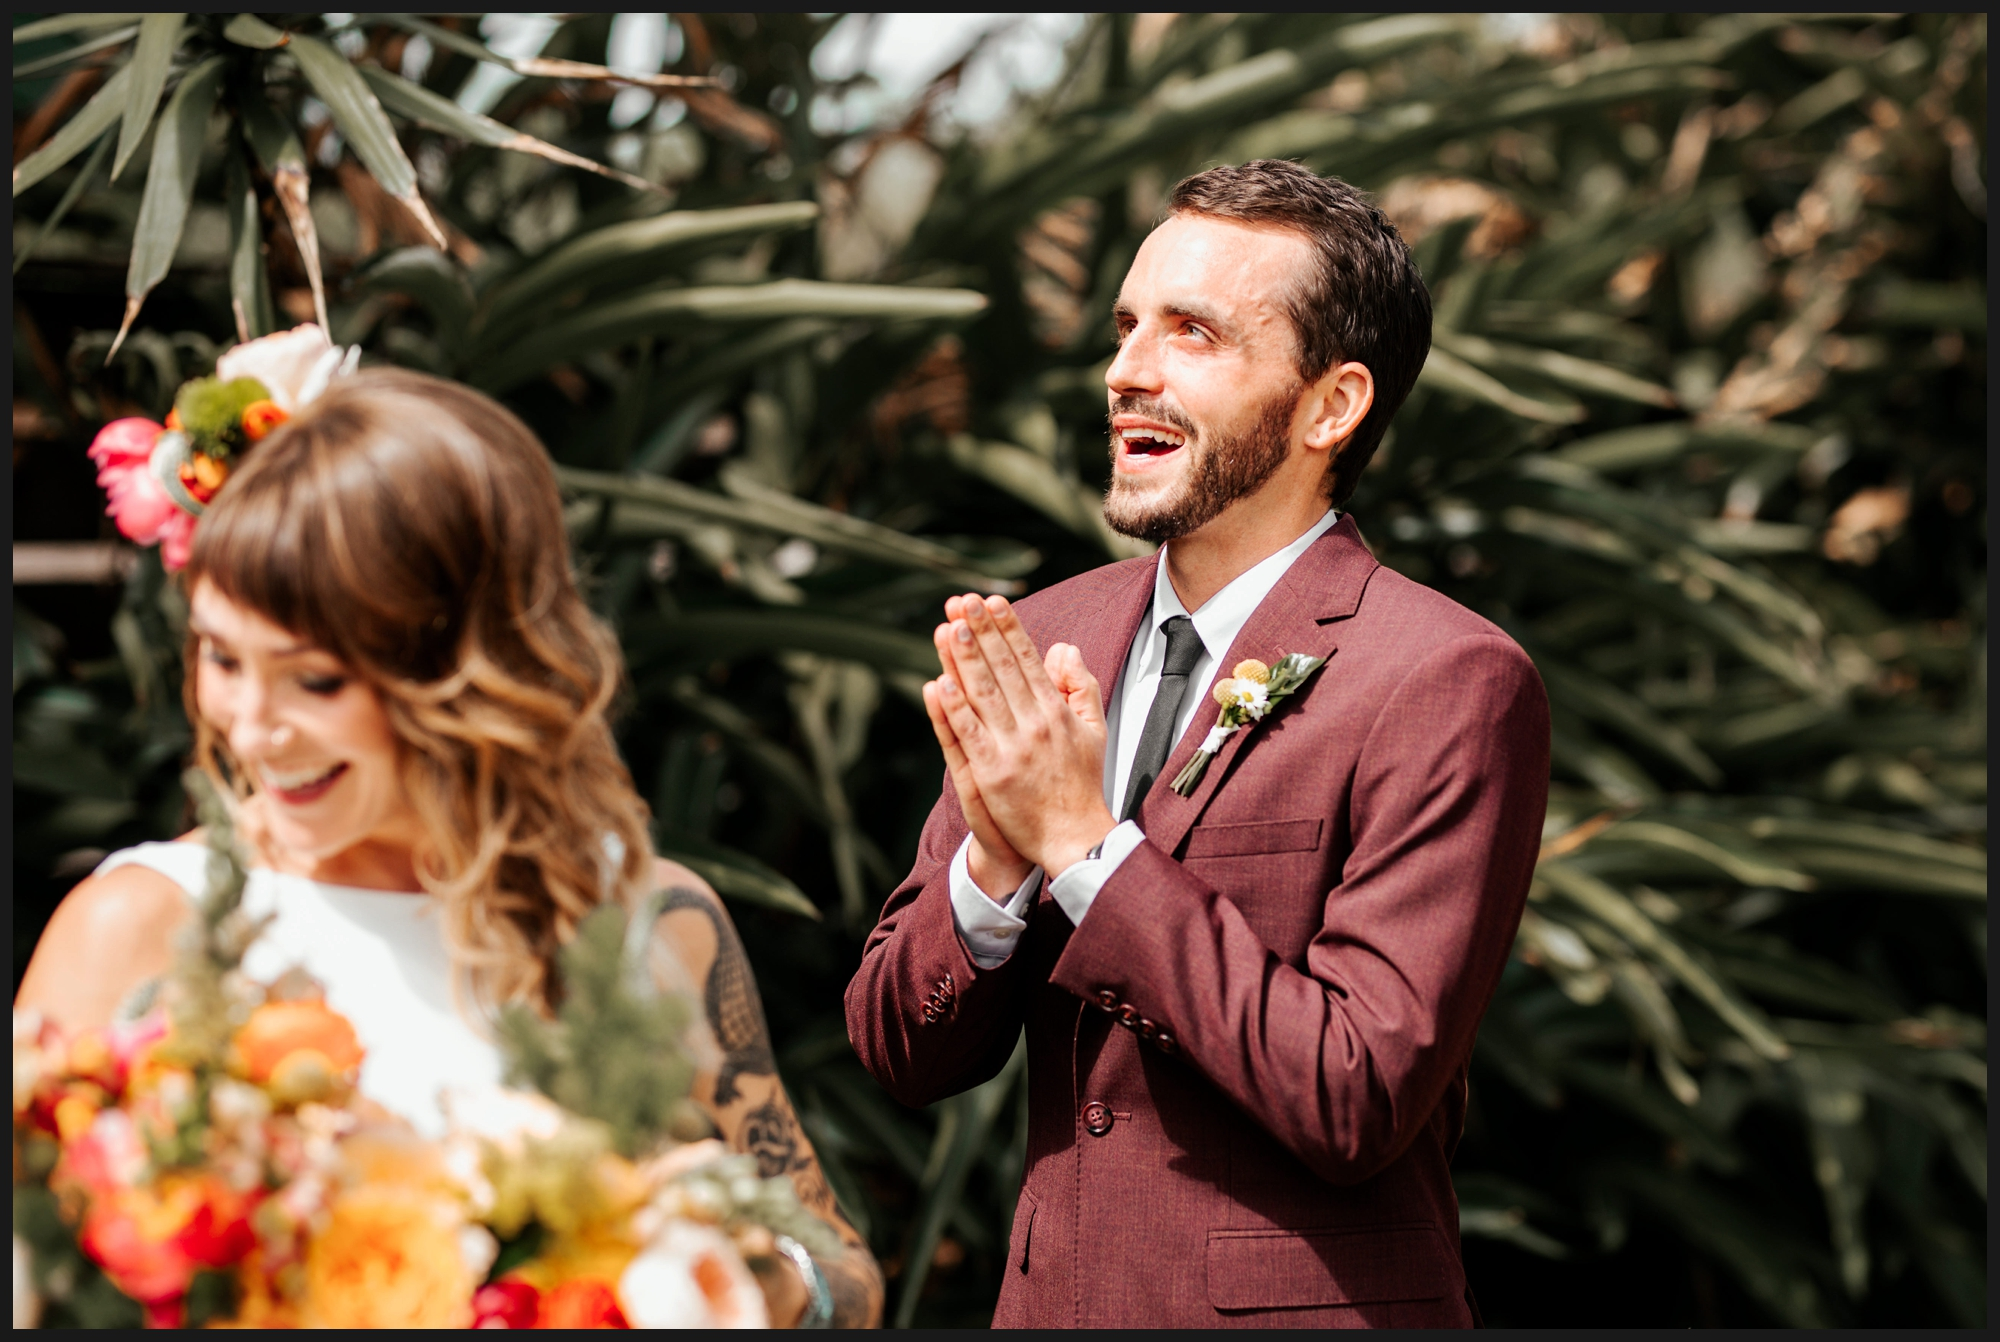 Orlando-Wedding-Photographer-destination-wedding-photographer-florida-wedding-photographer-bohemian-wedding-photographer_1974.jpg